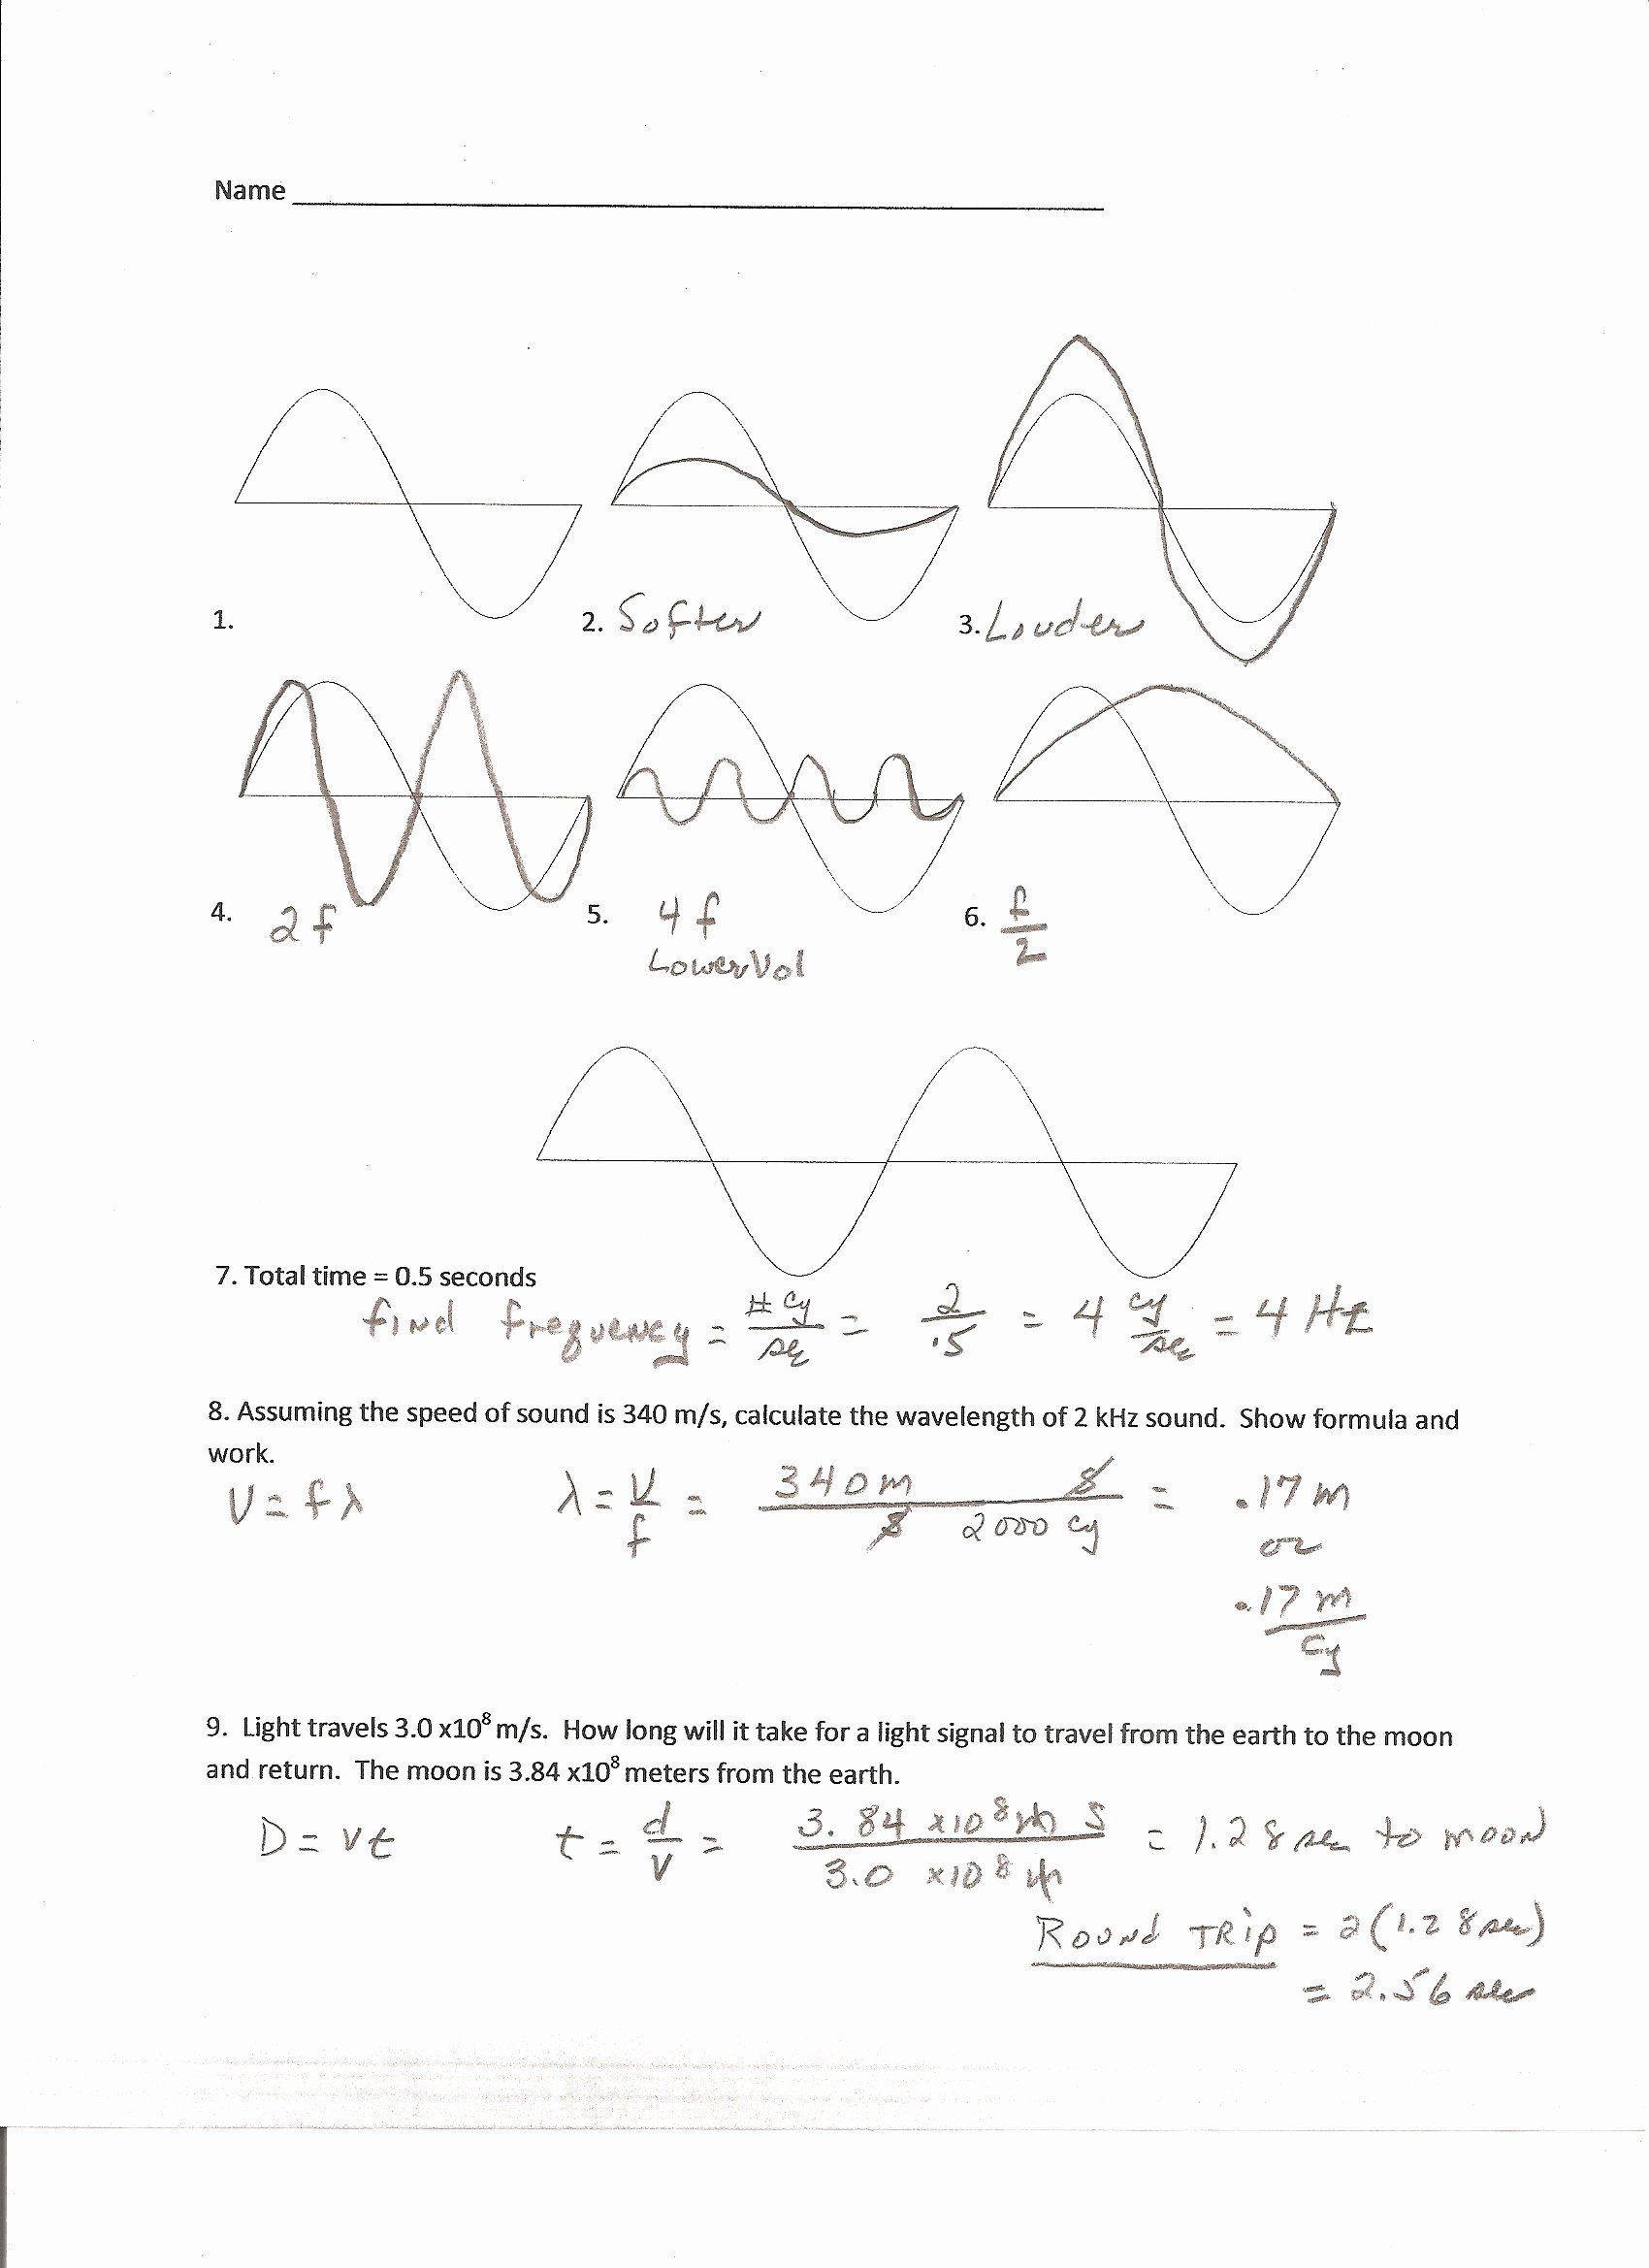 Wave Review Worksheet Answer Key Inspirational Worksheet